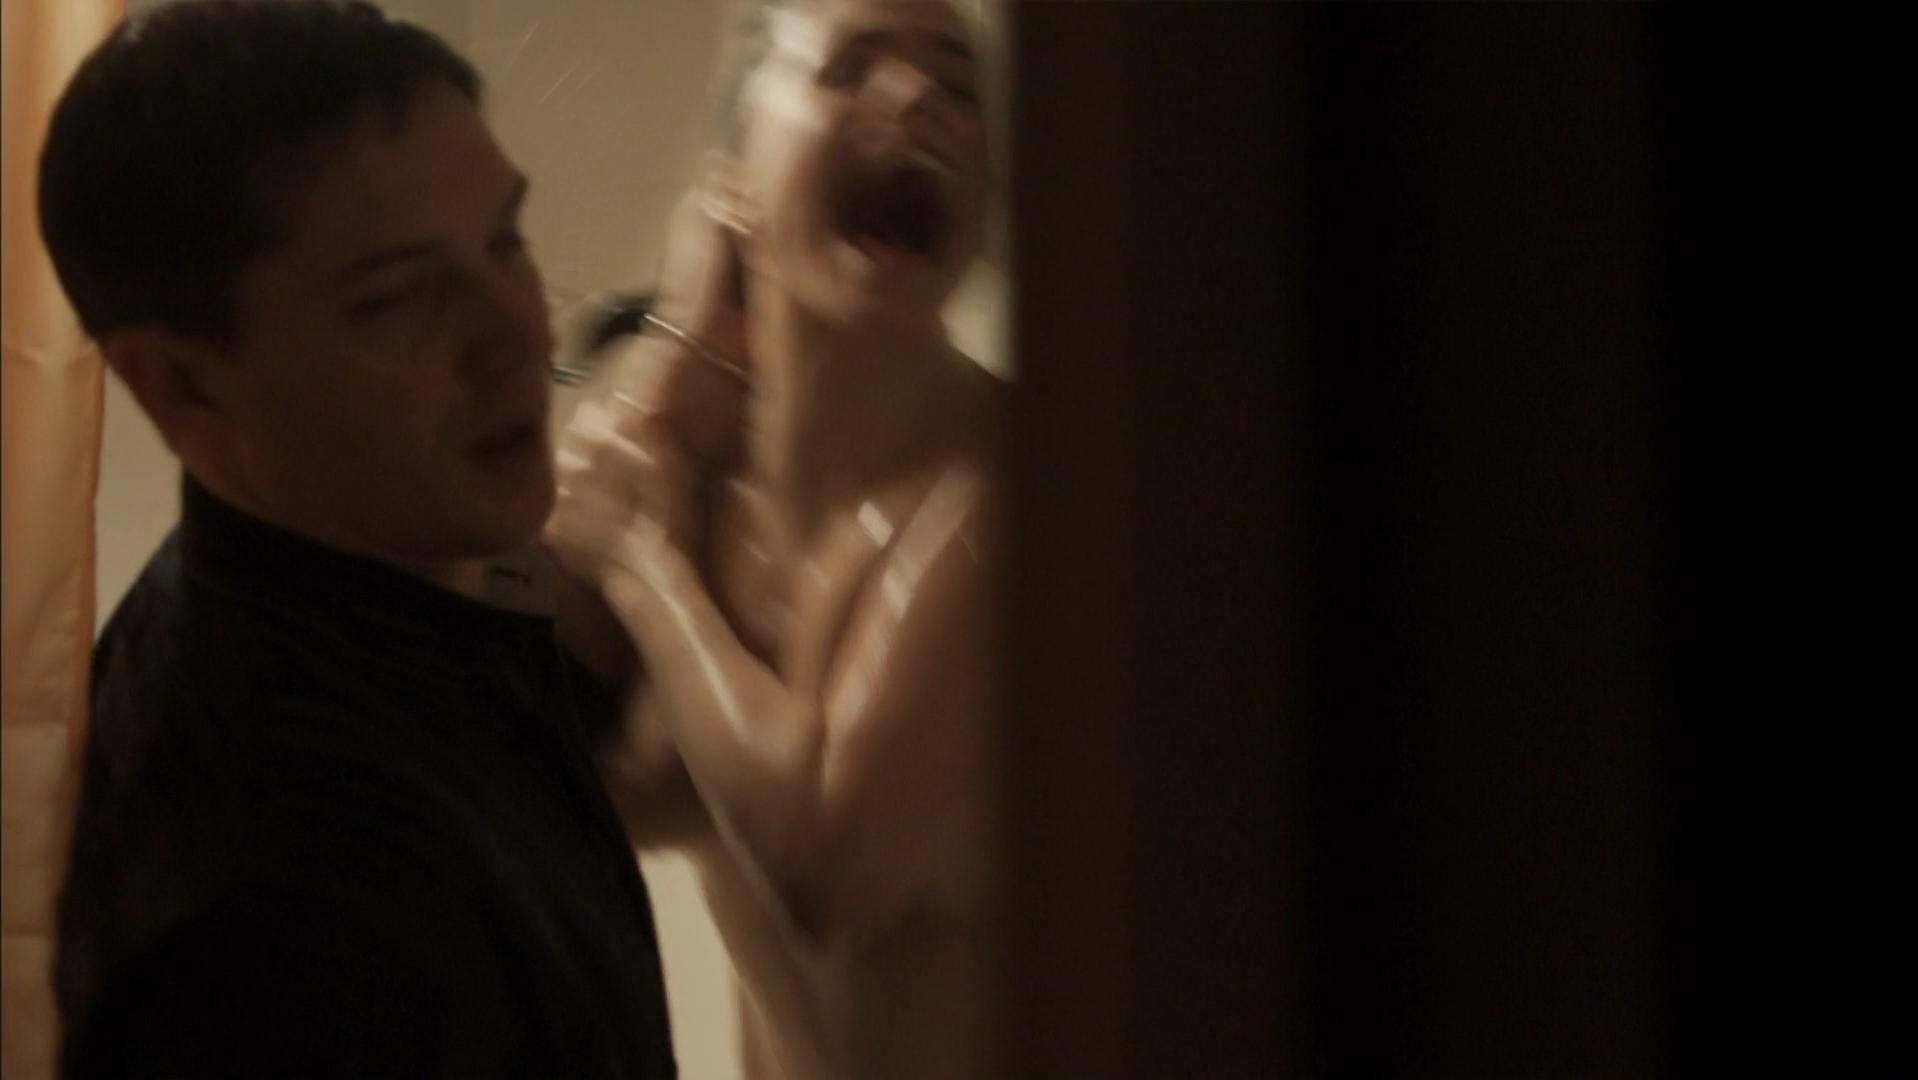 Nude Video Celebs  Charlotte Riley Nude - The Take S01E02 -8319